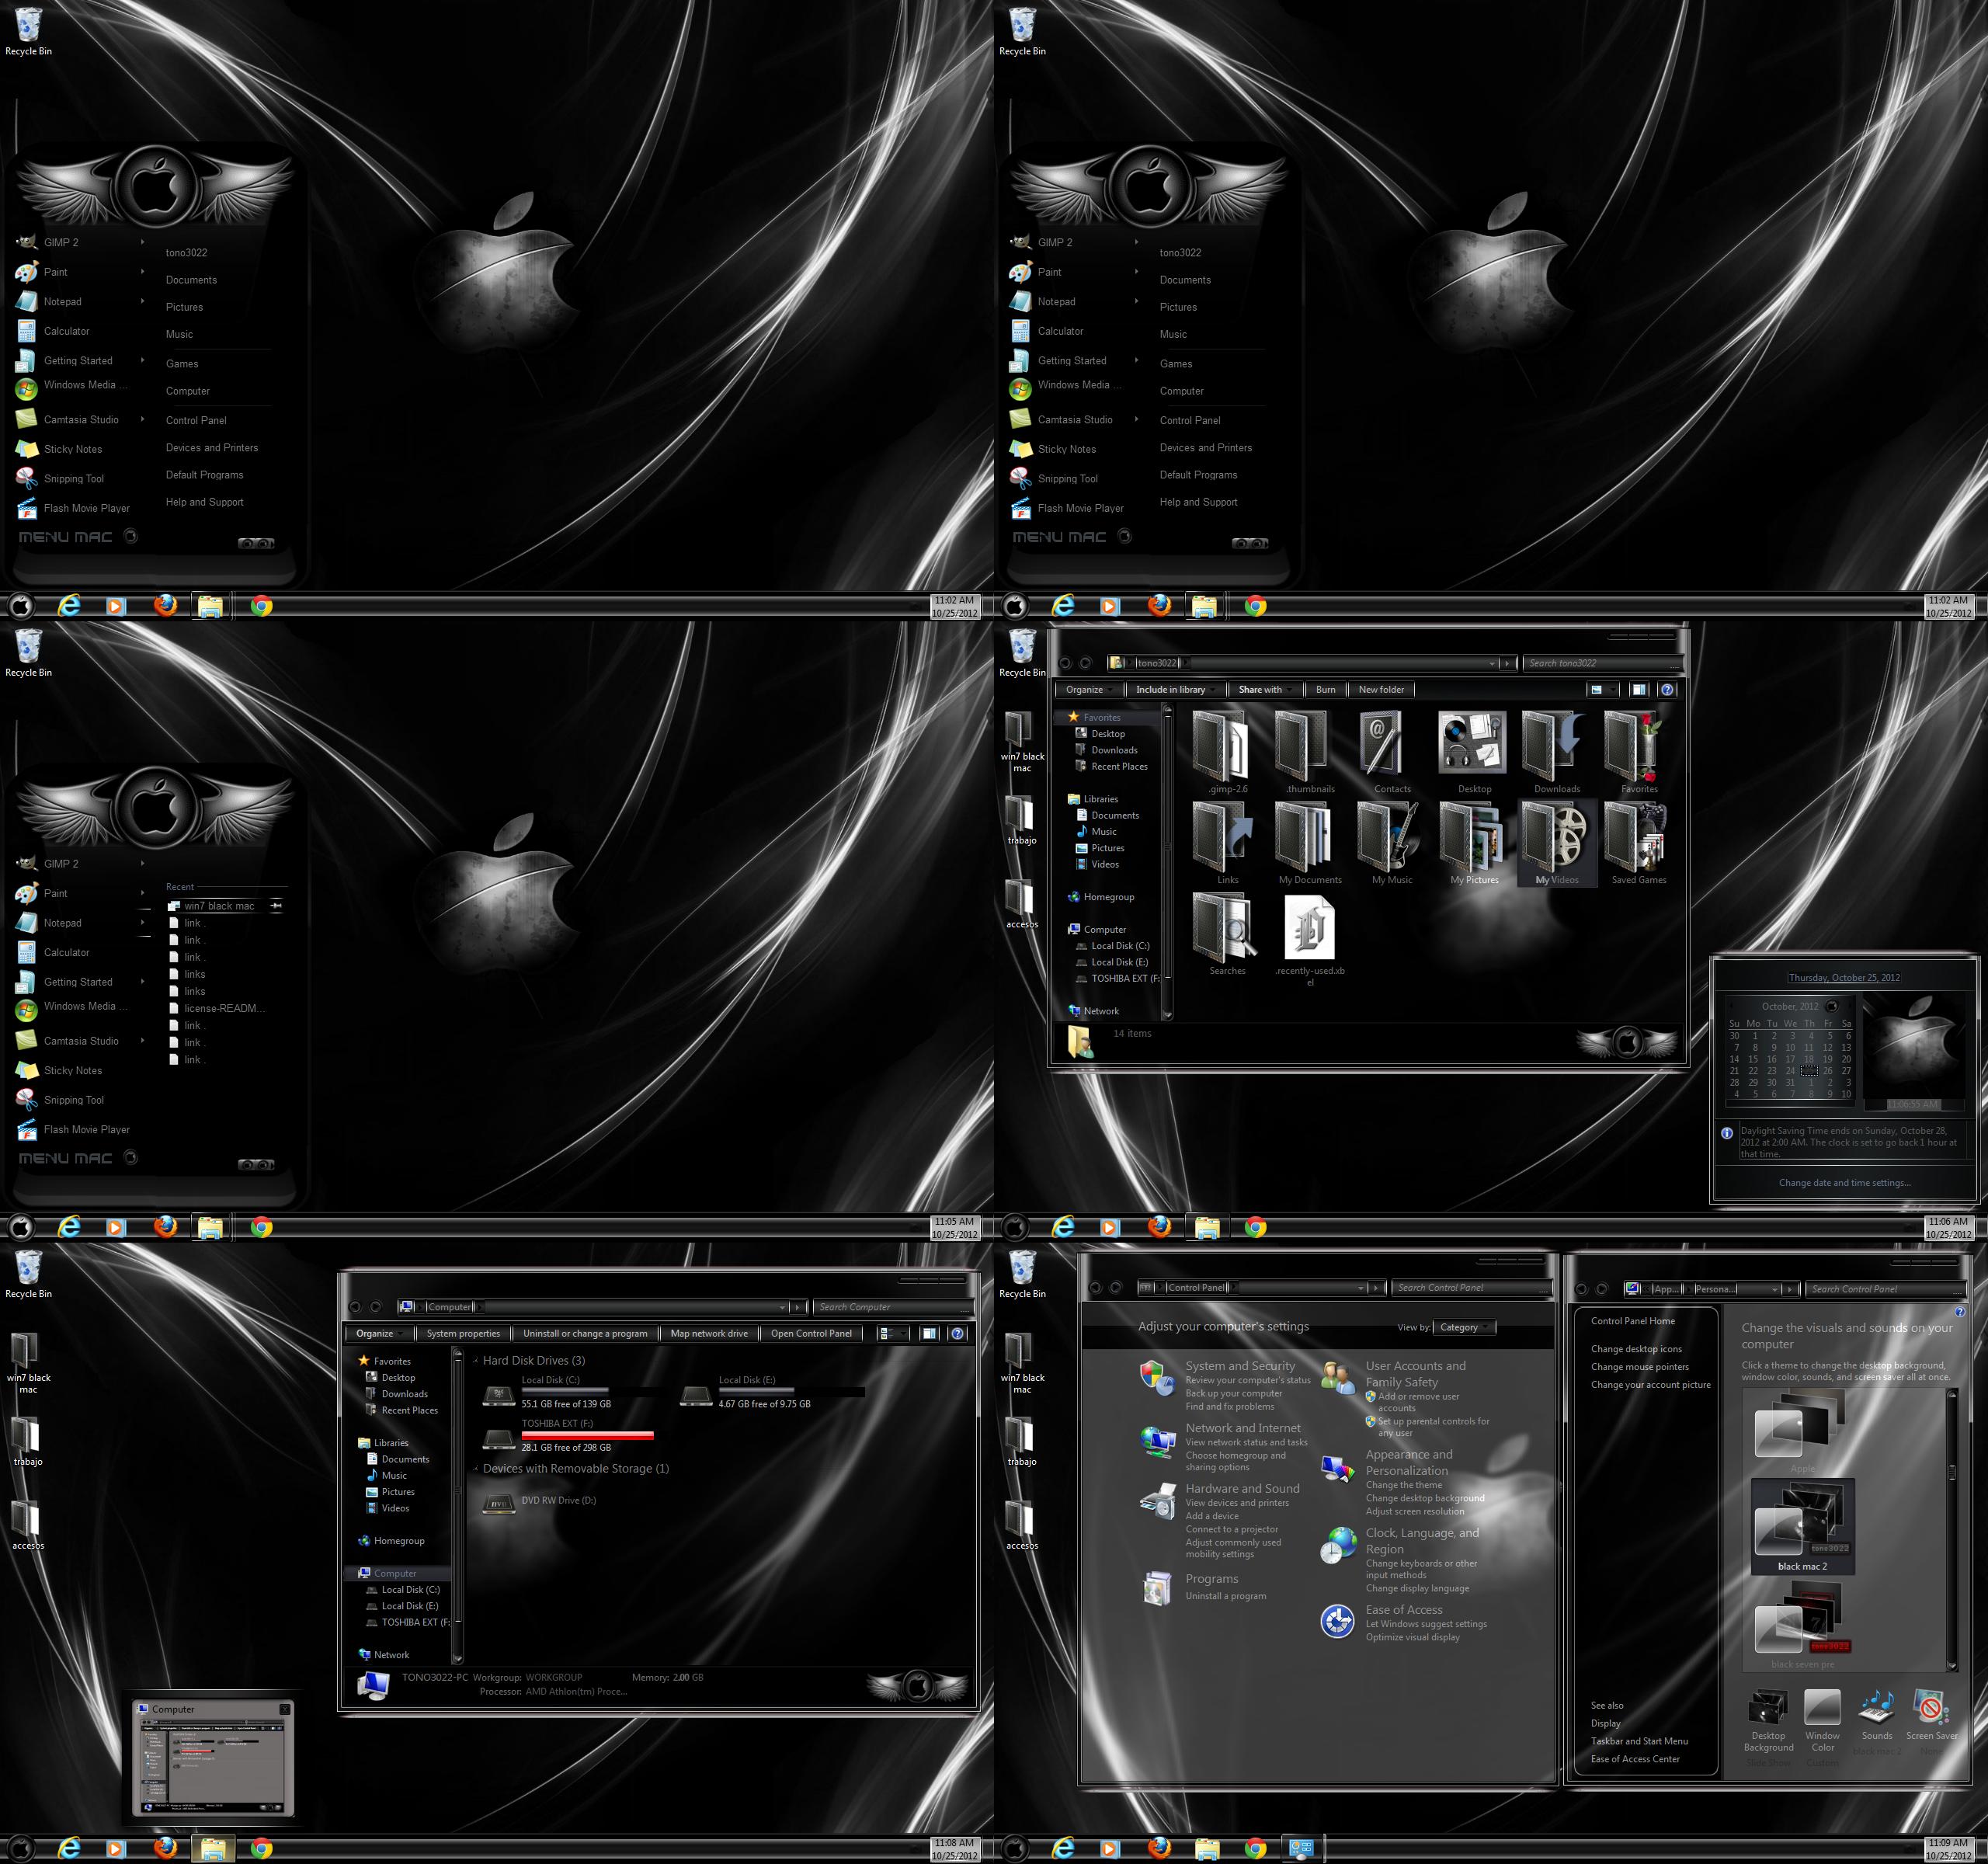 windows 7 theme black glass mac by customizewin7 on DeviantArt